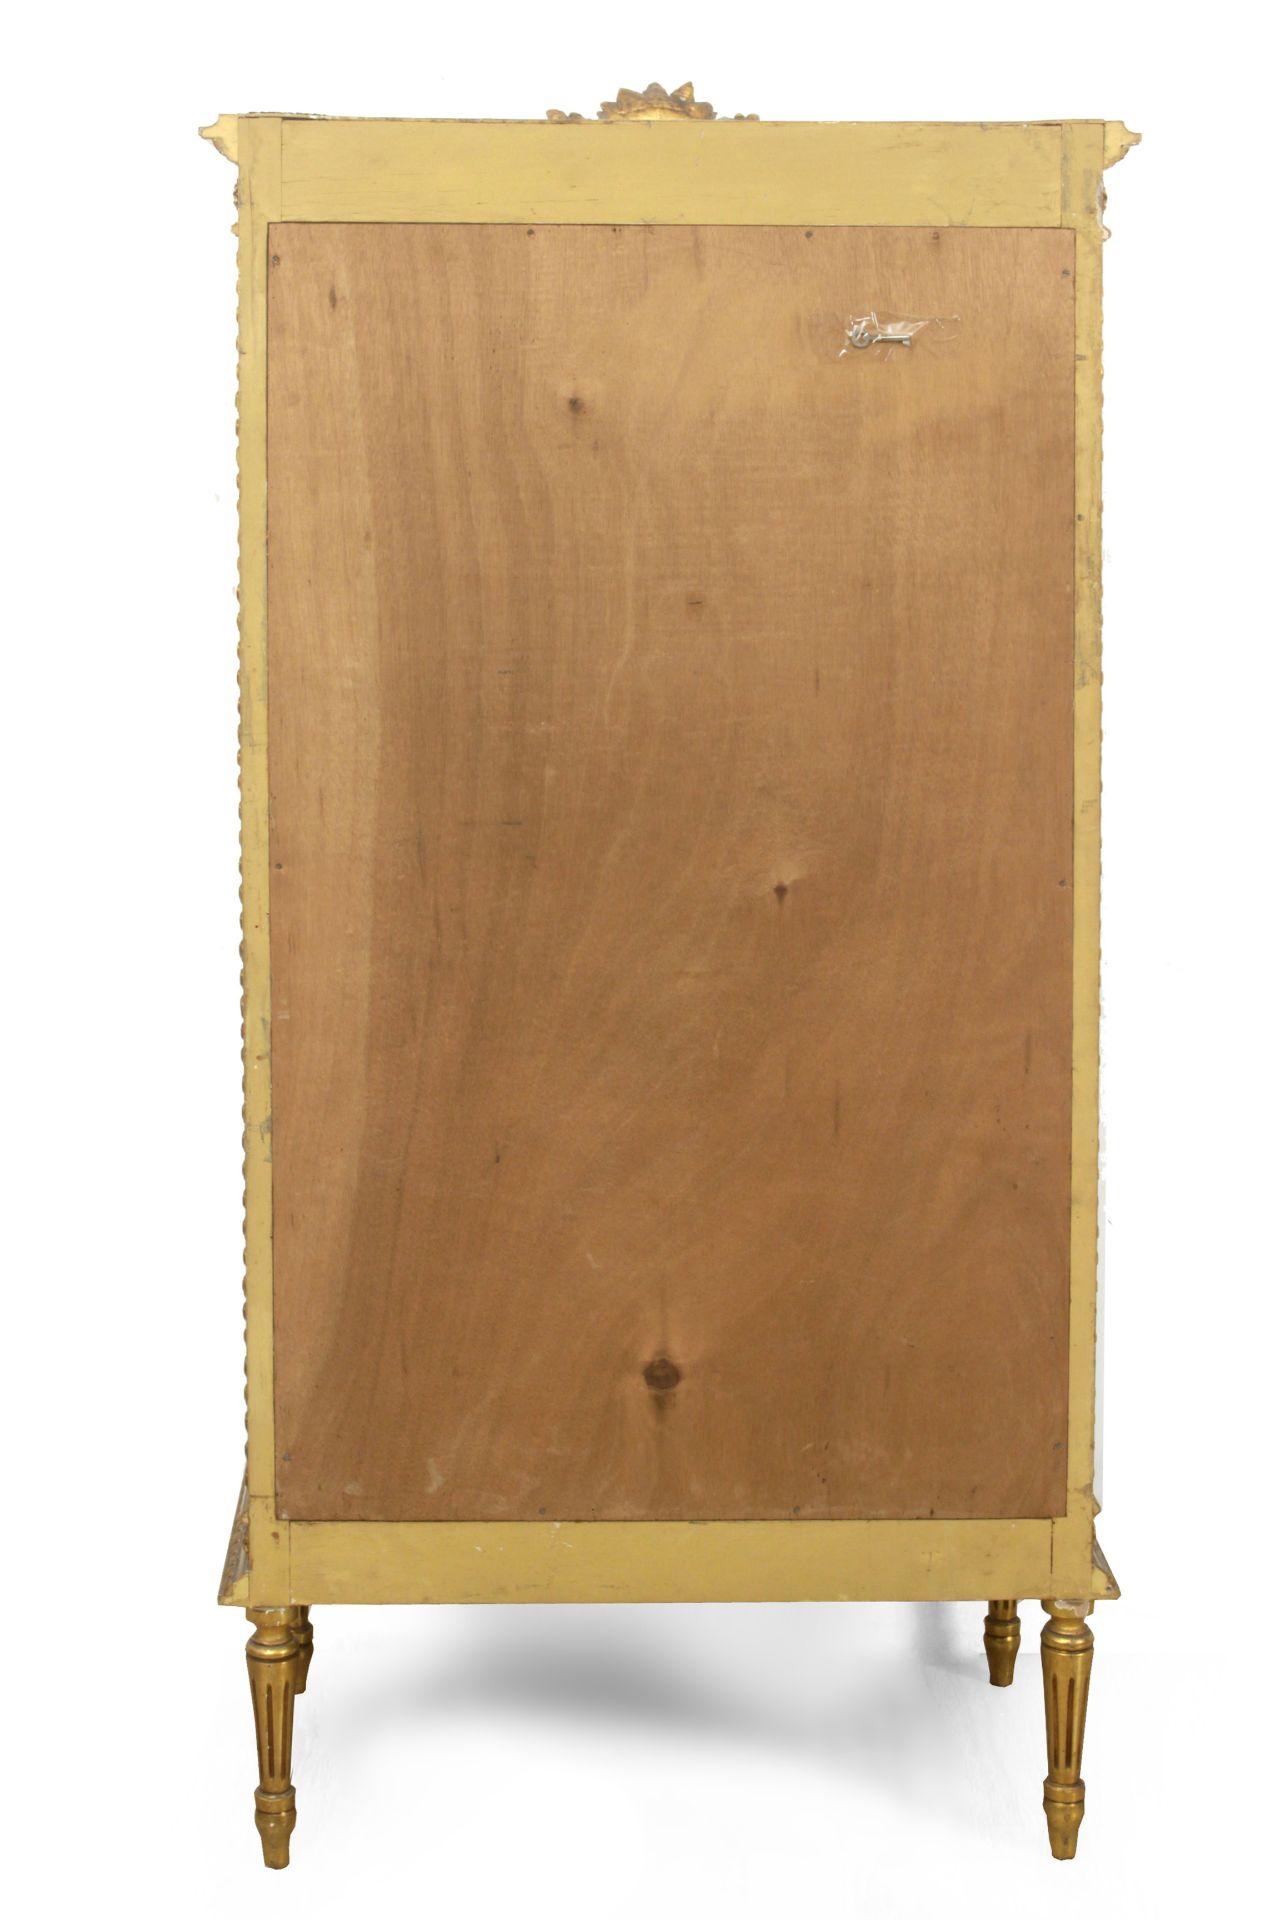 A 20th century Louis XVI style glass cabinet - Bild 3 aus 3